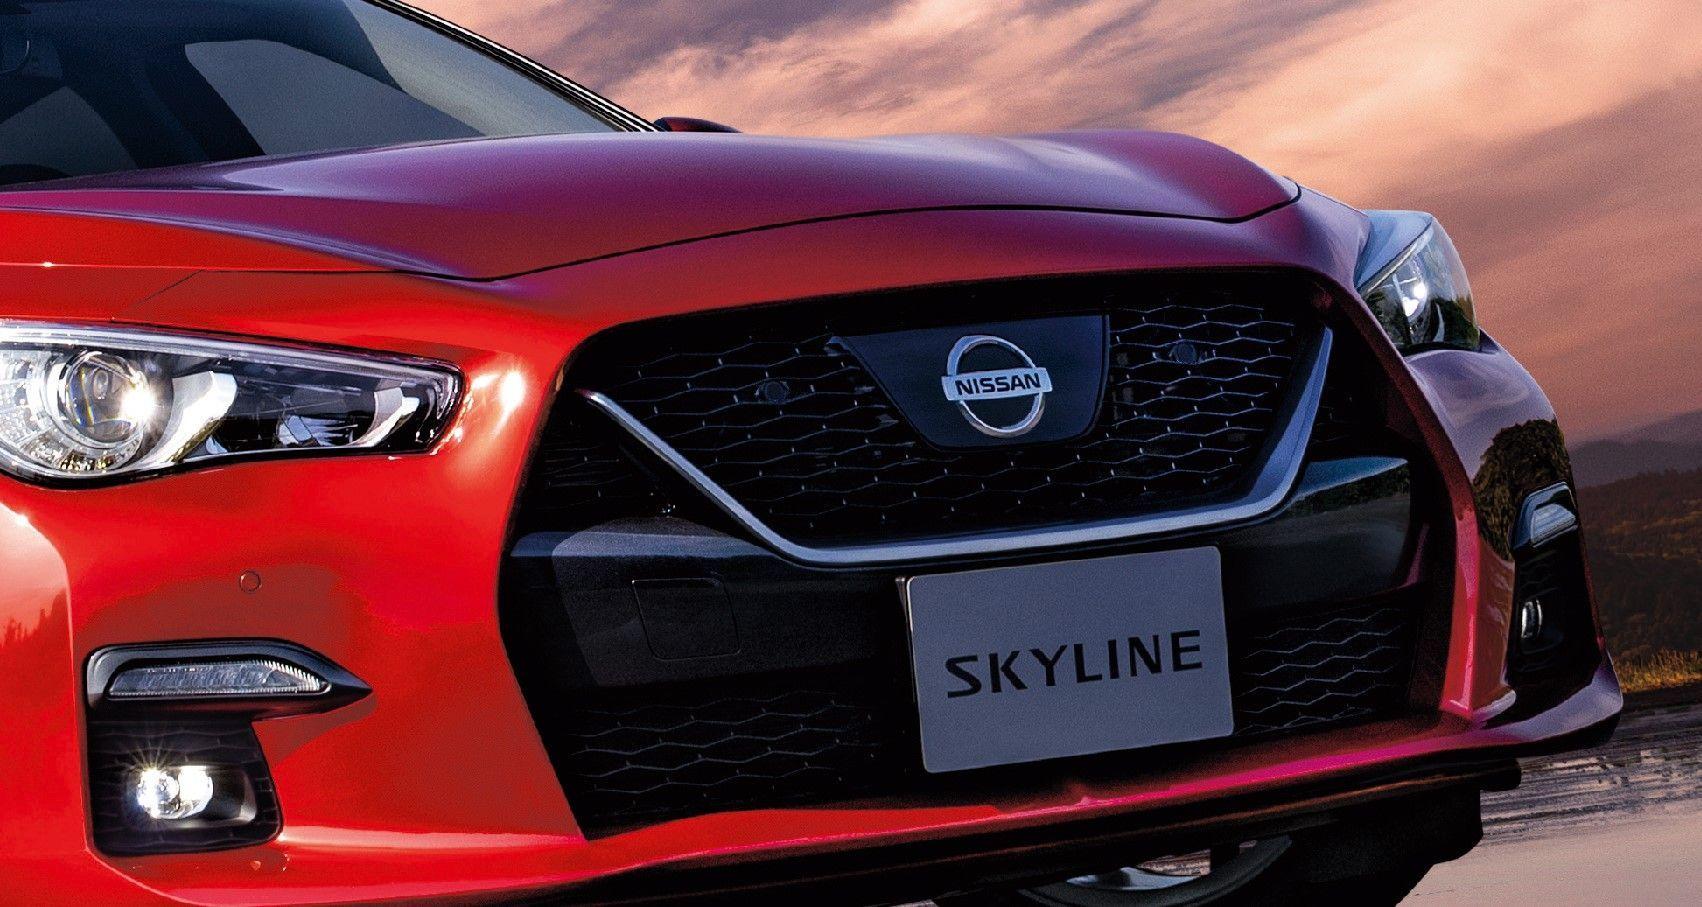 2020 Nissan Skyline [V37]. Infiniti Q50 design, with